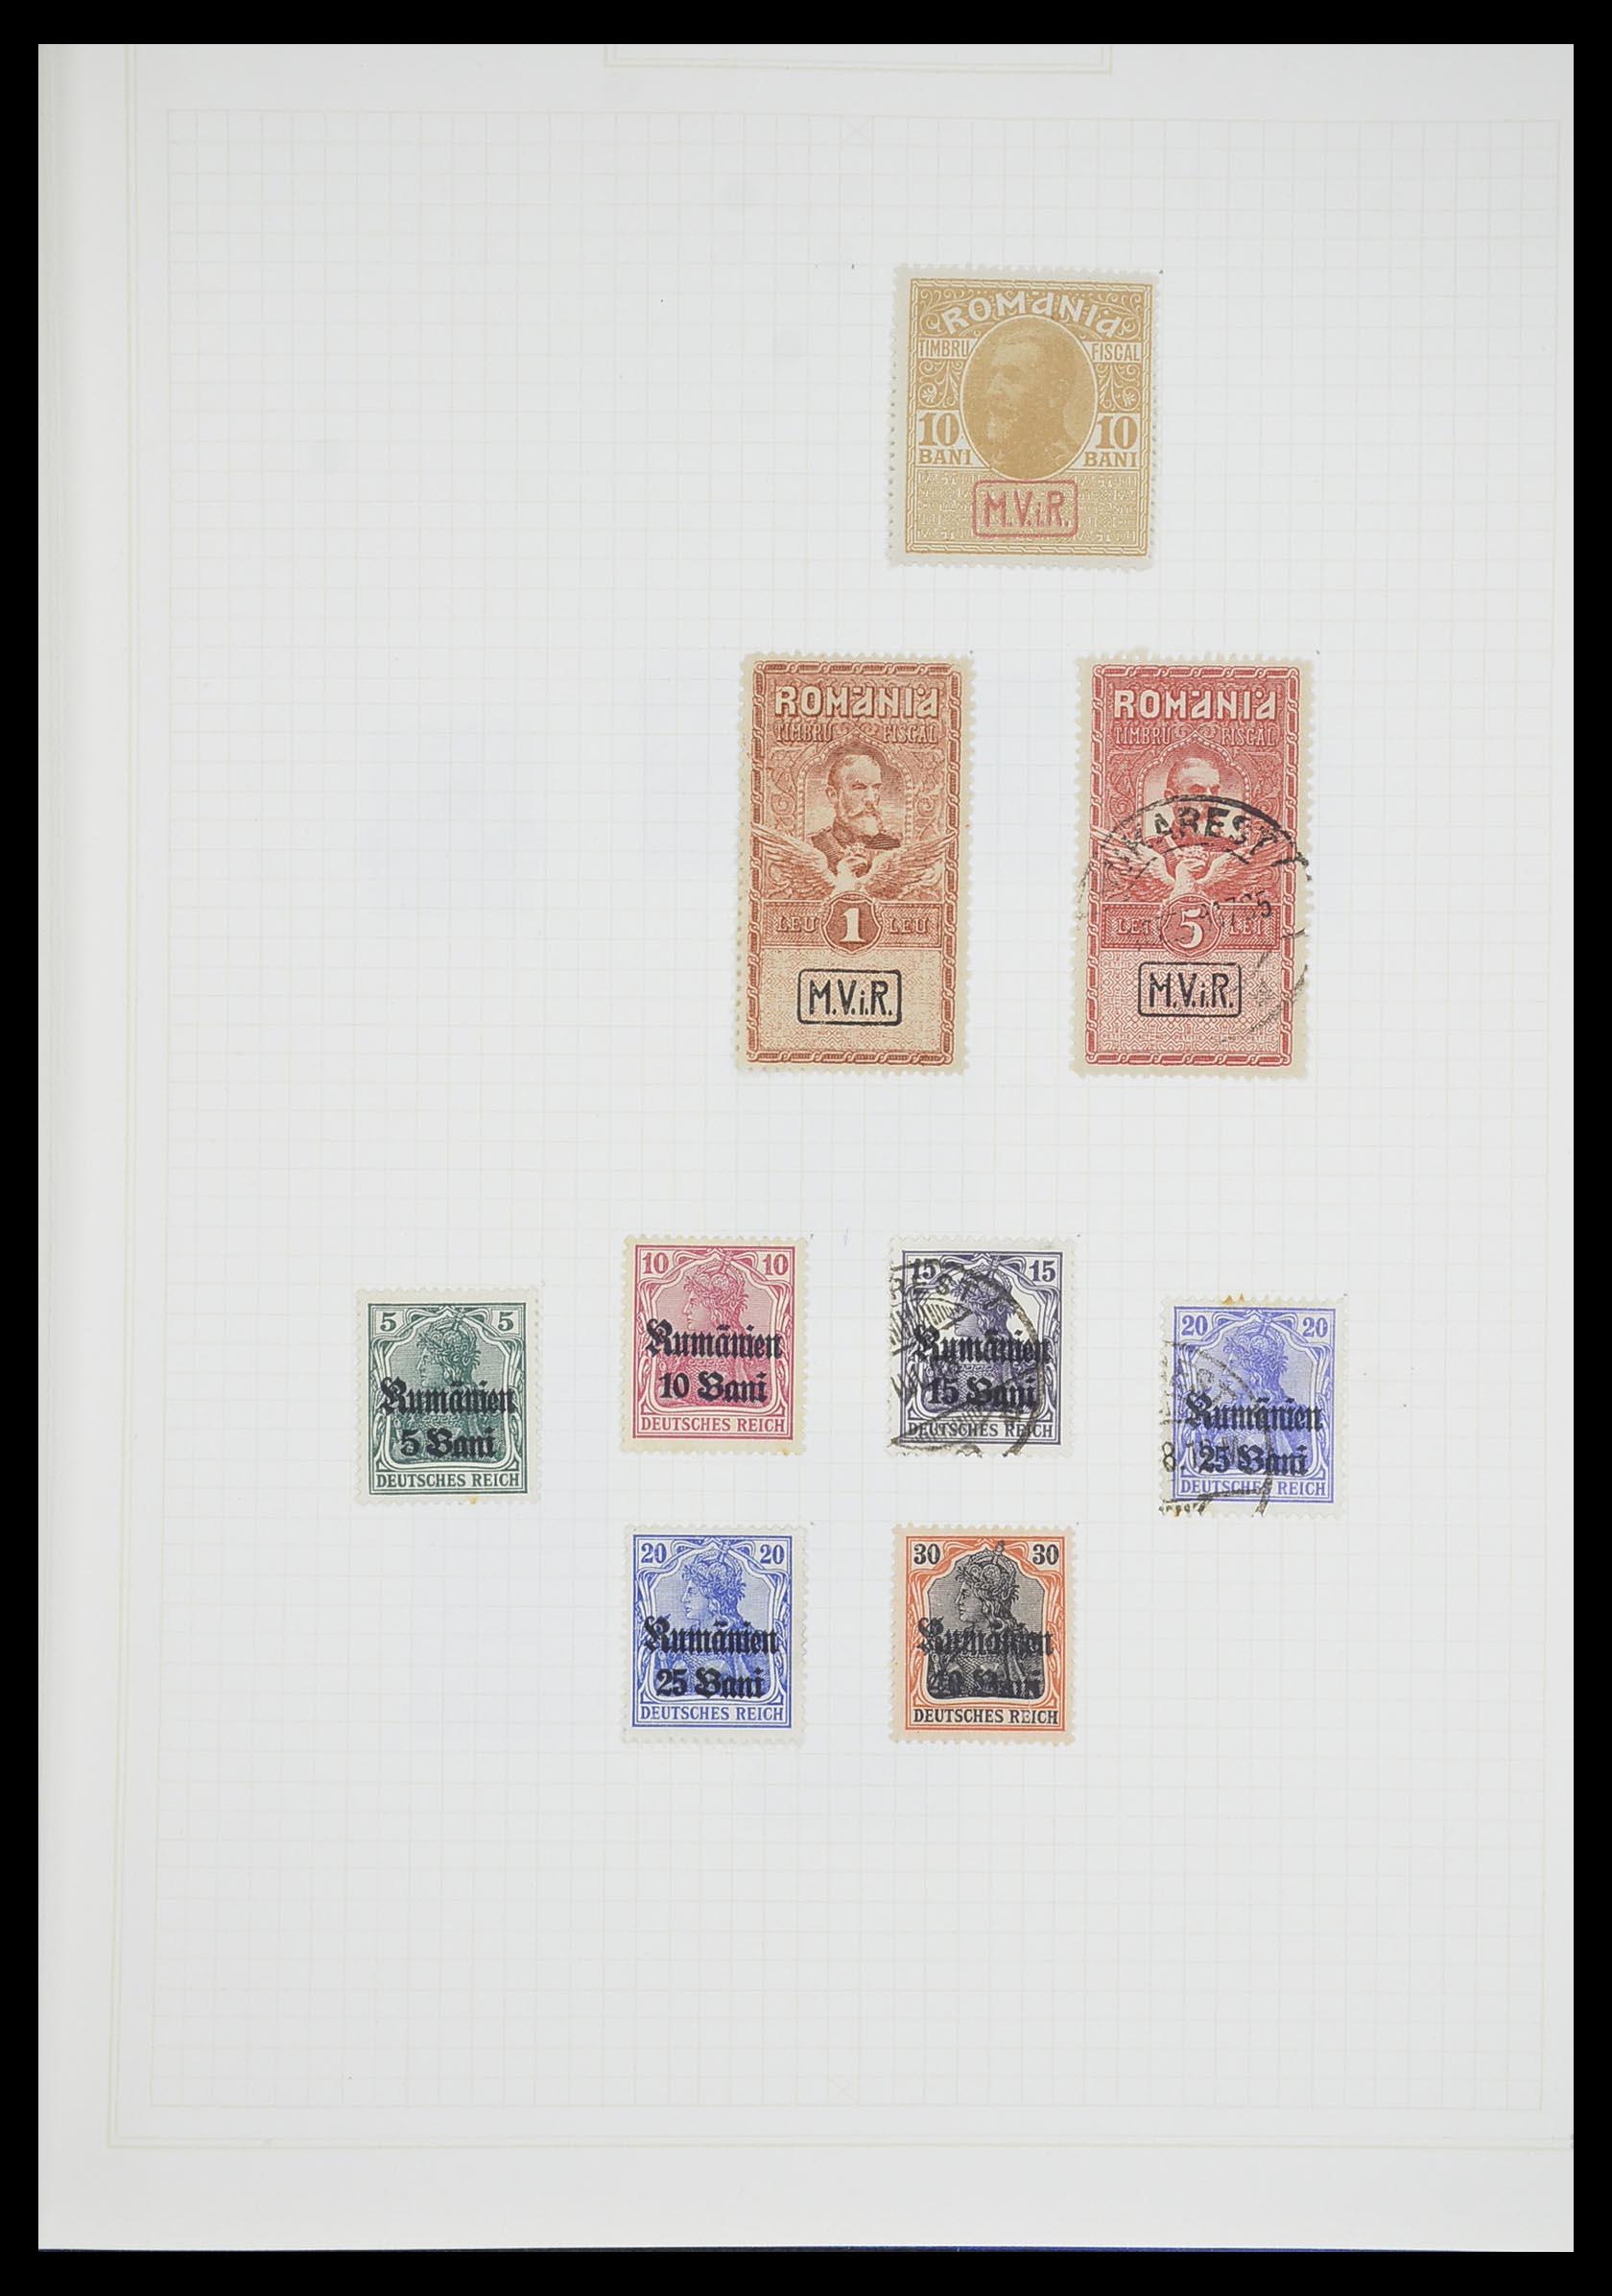 33713 008 - Postzegelverzameling 33713 Duitse bezettingen WO I en WO II 1914-1945